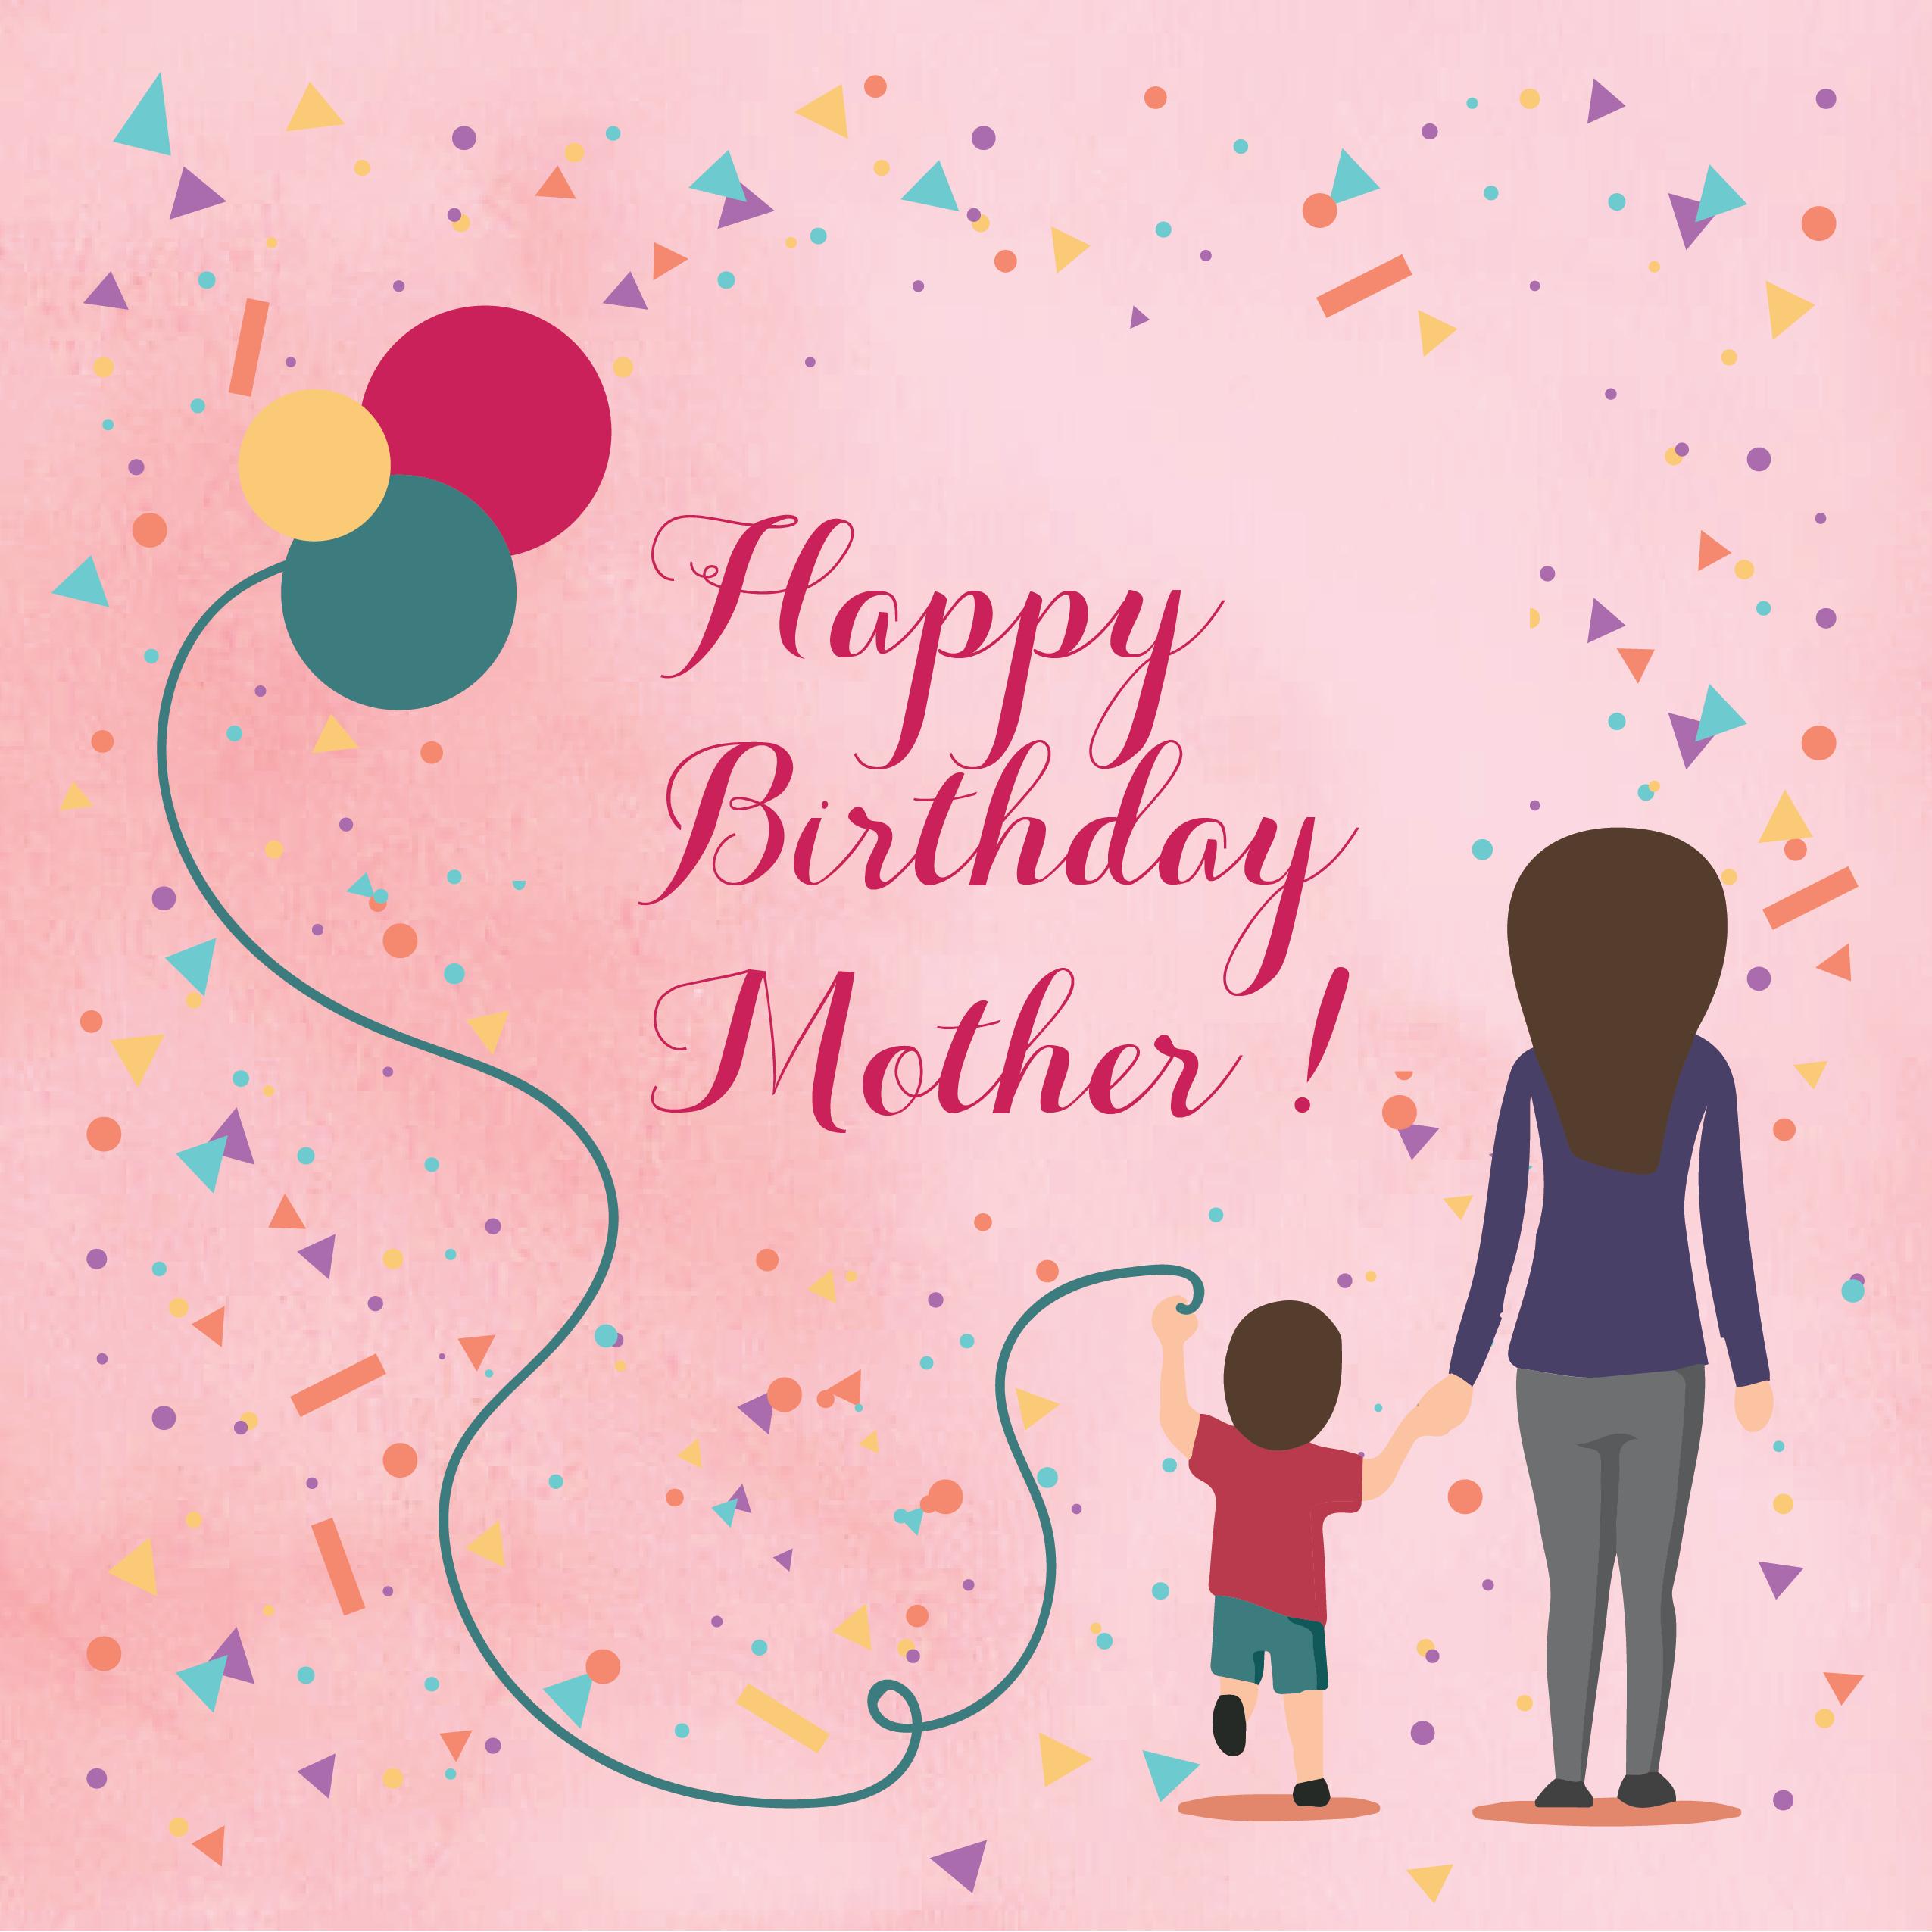 Happy-Birthday-Wishes-Mother